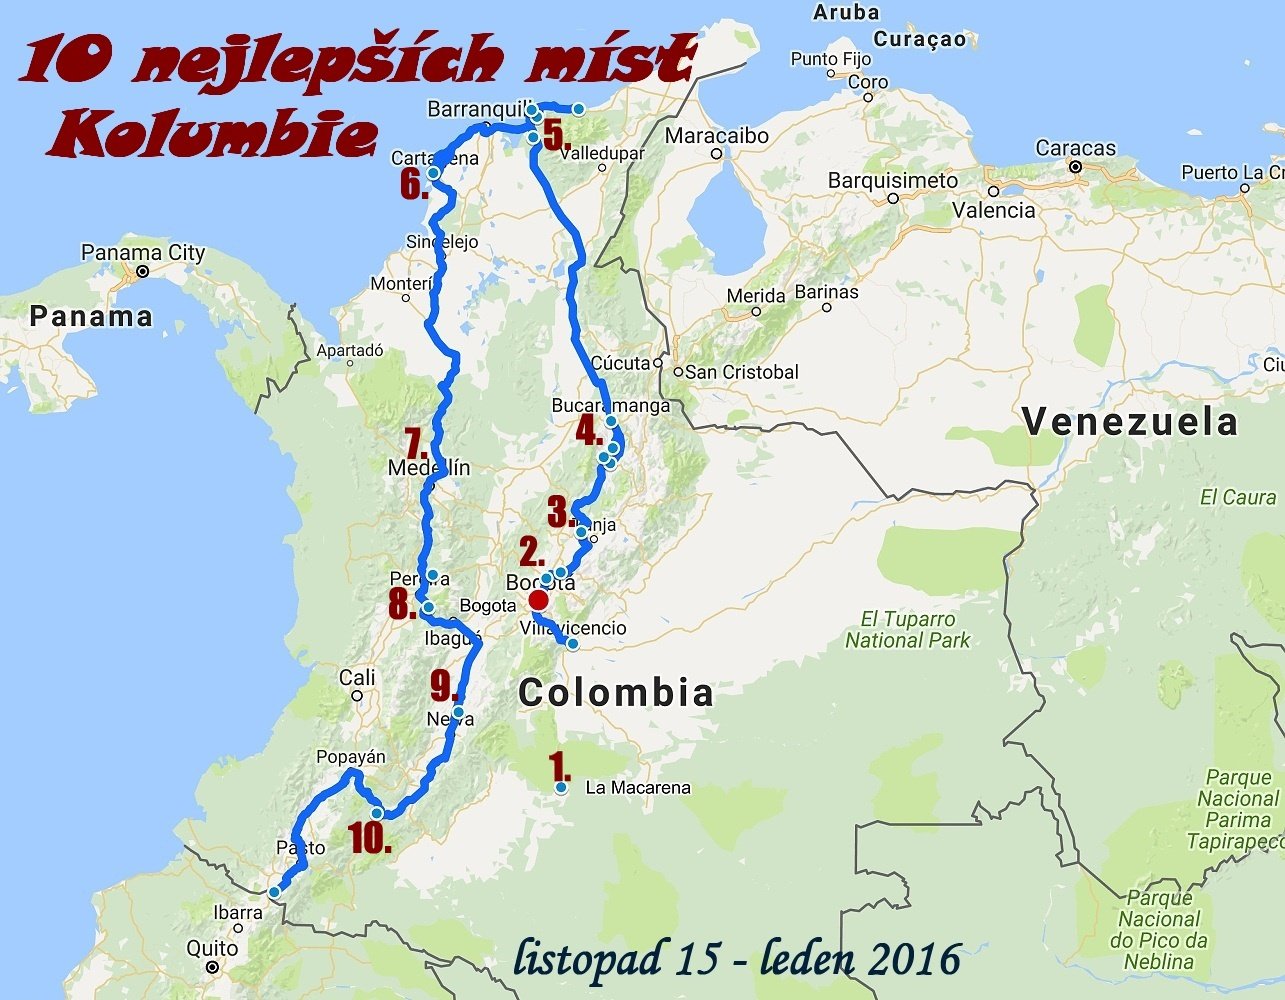 10 Nejlepsich Mist Kolumbie Pro Kazdeho Natura Linda Com